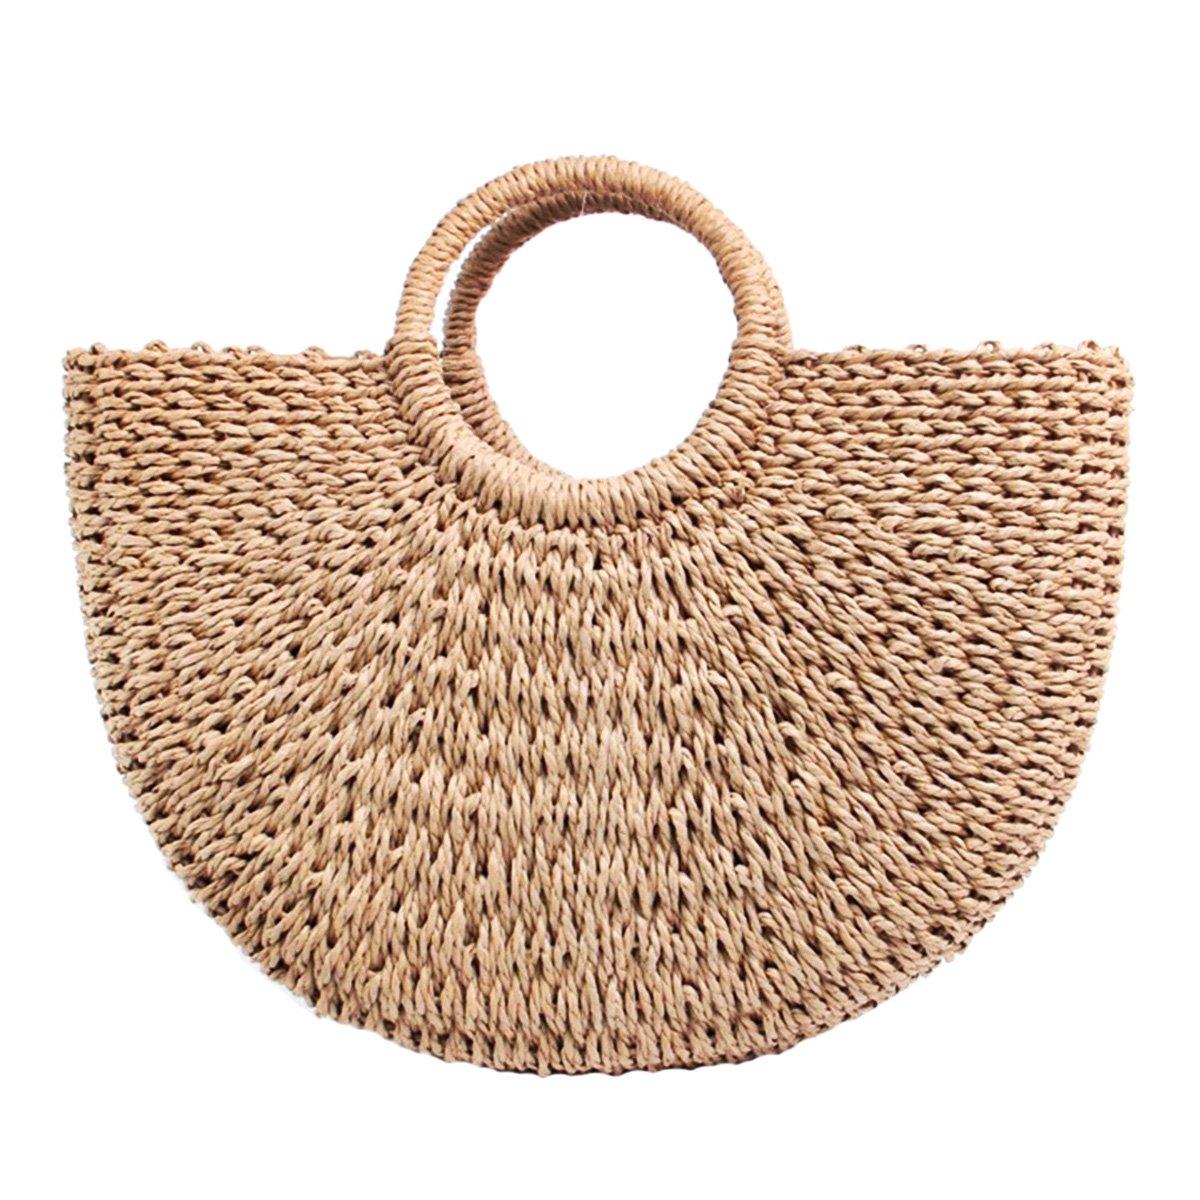 Natural Chic Straw Bag Hand Woven Moon Handle Handbags Water Hyacinth Handmade Summer Bag Beach Bag